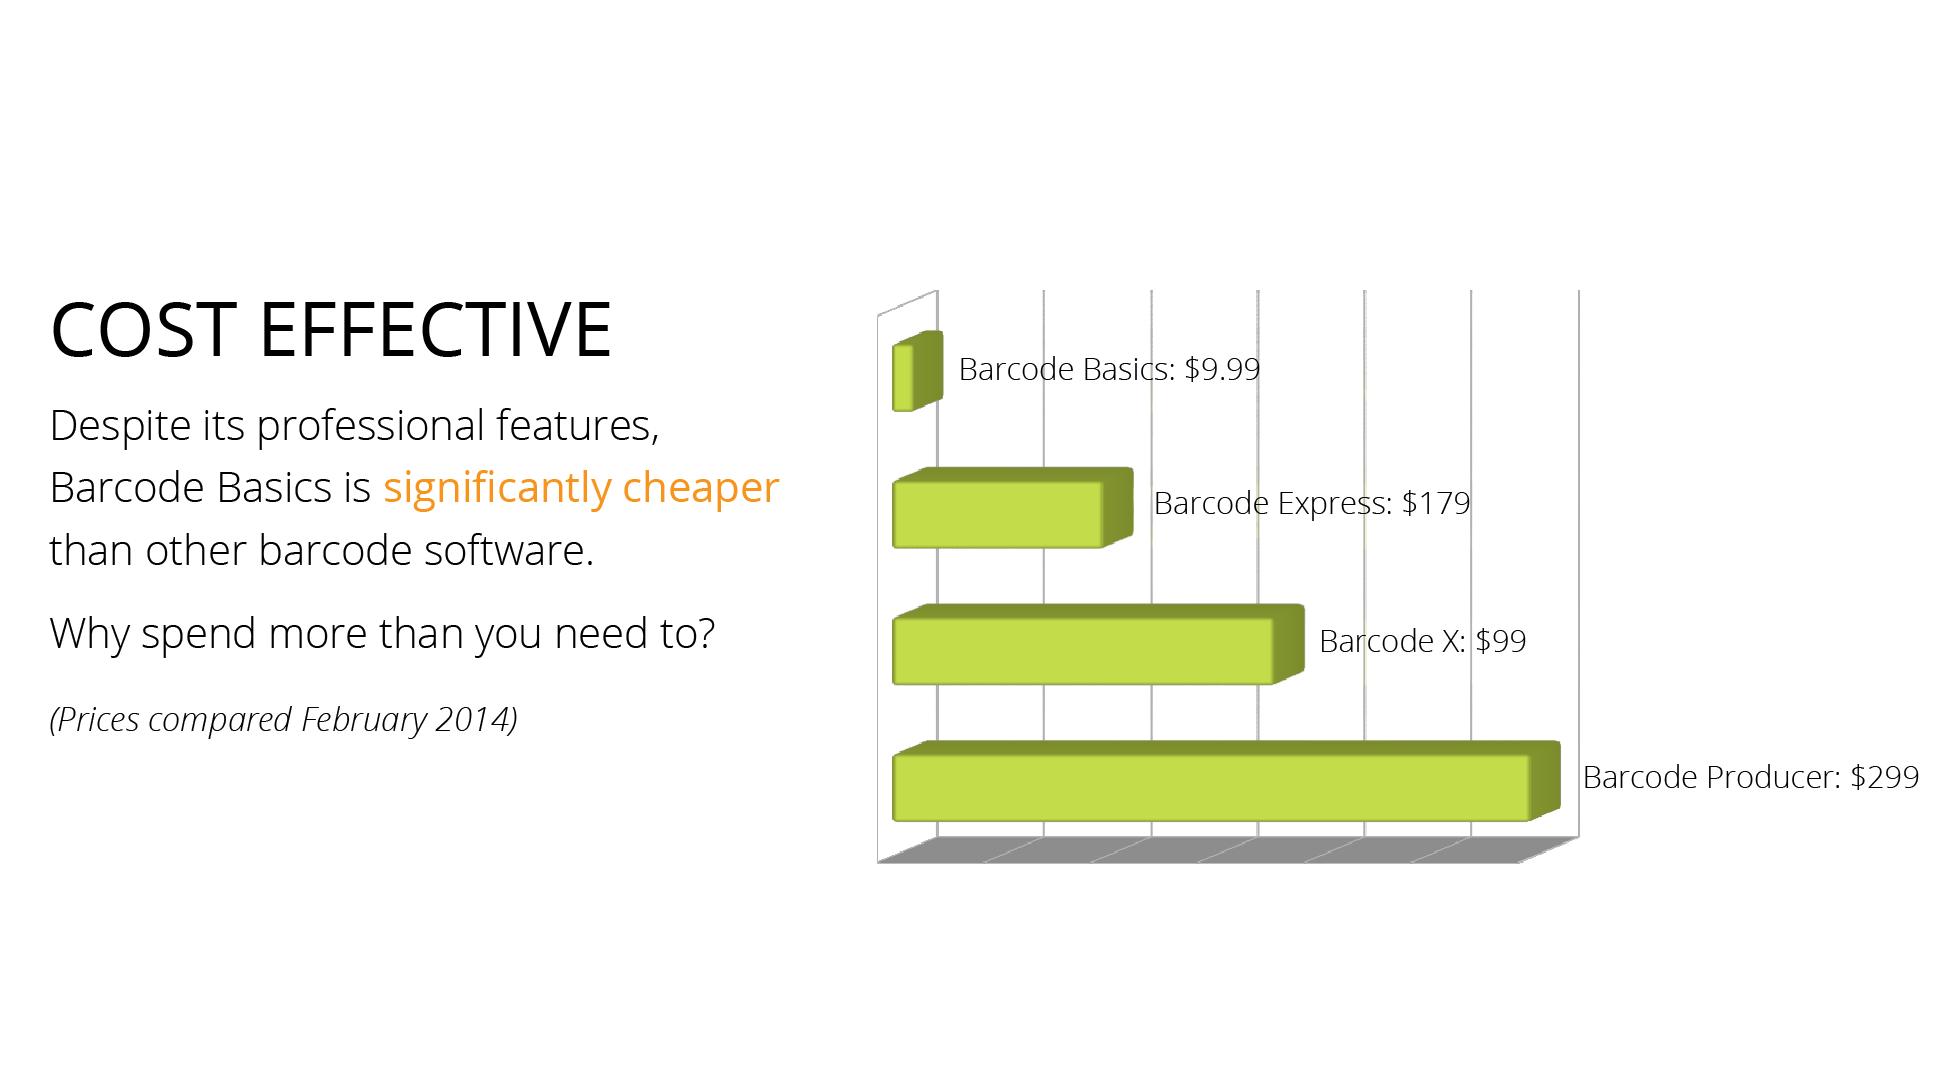 Cost effective mac barcode software